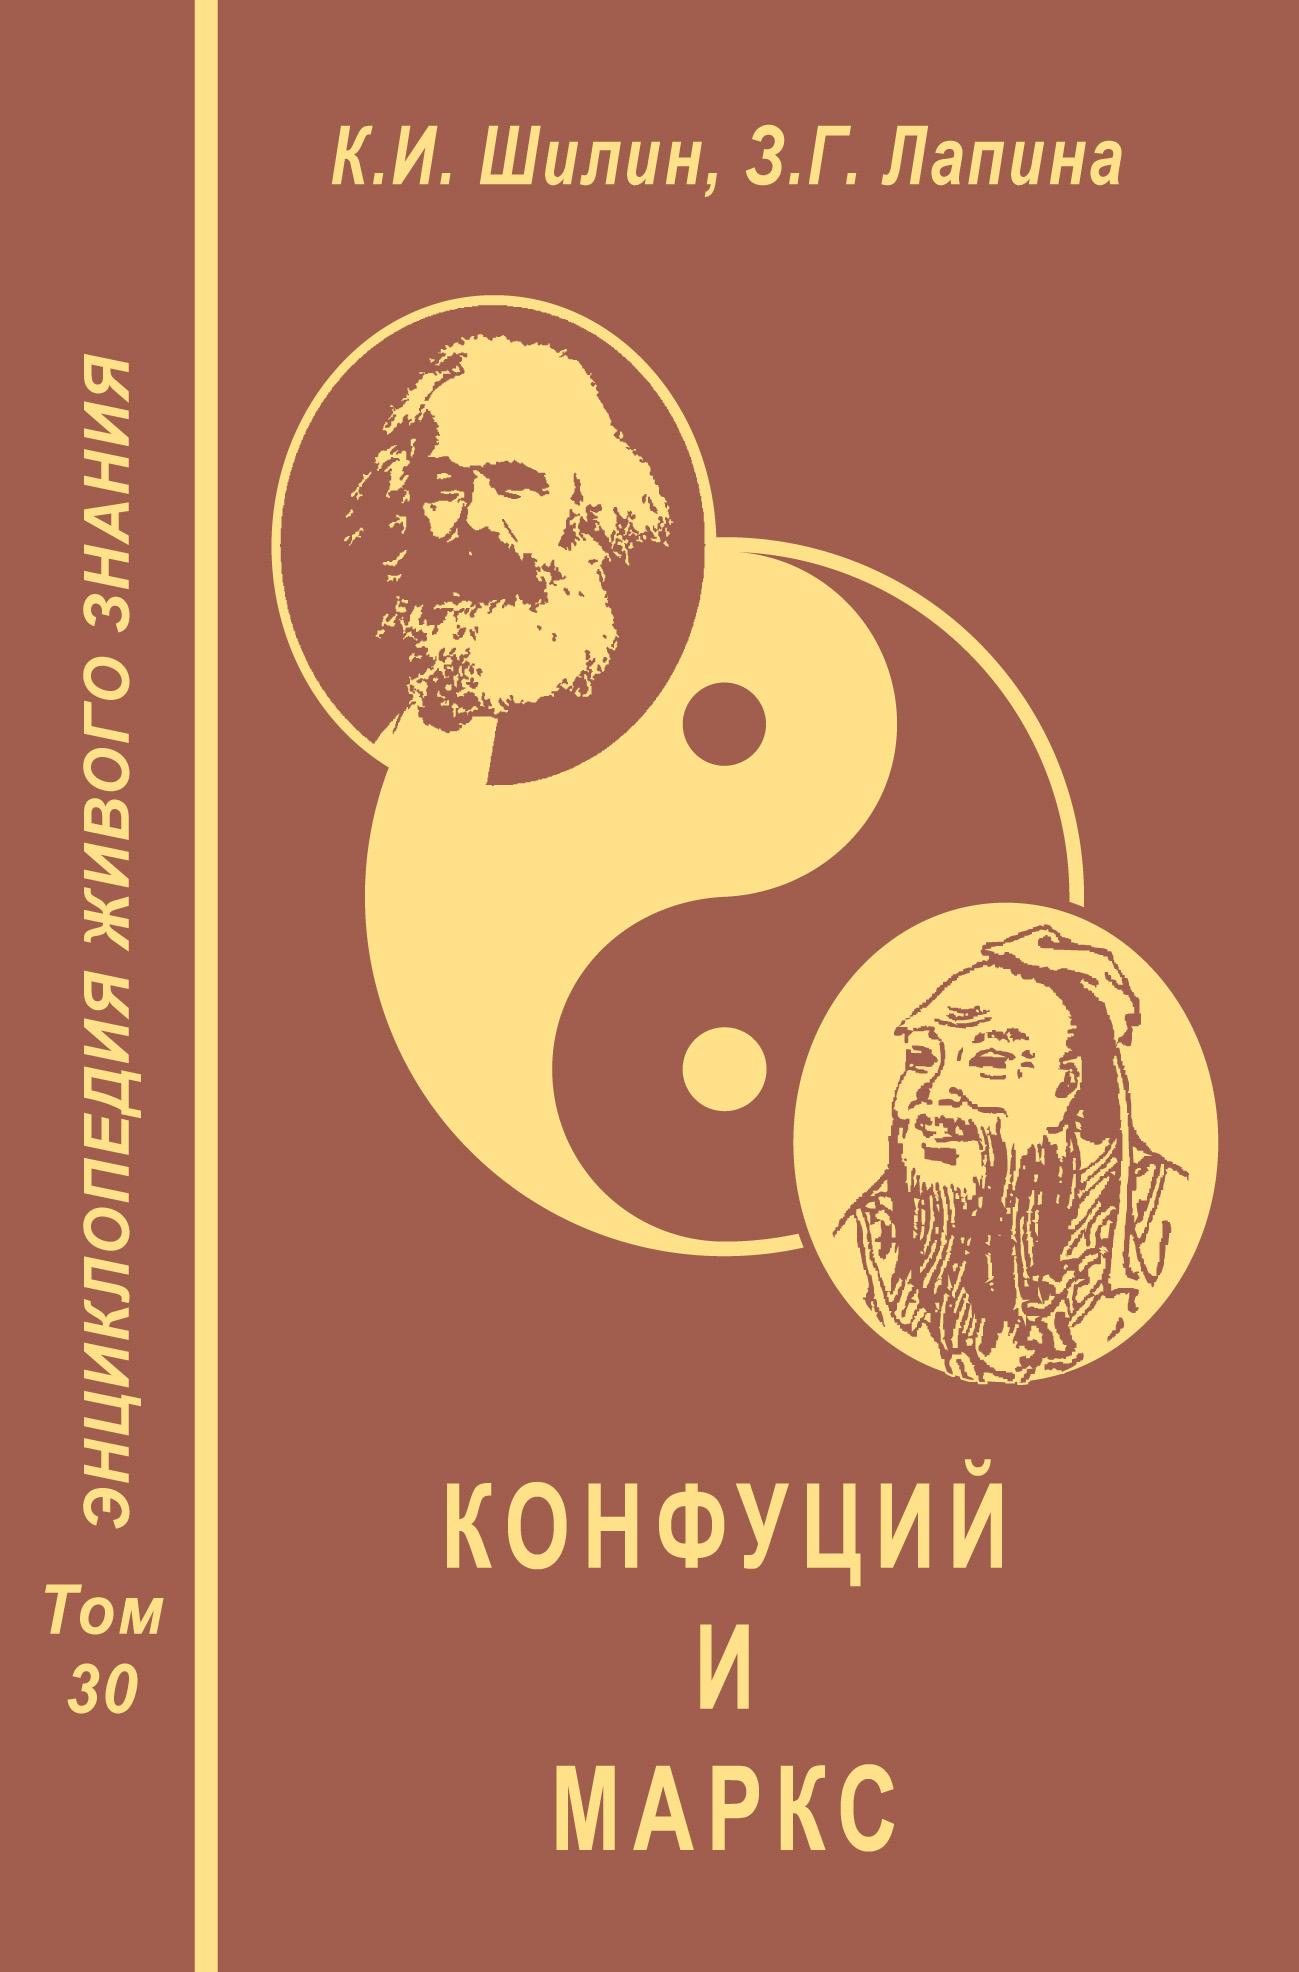 Конфуций и Маркс